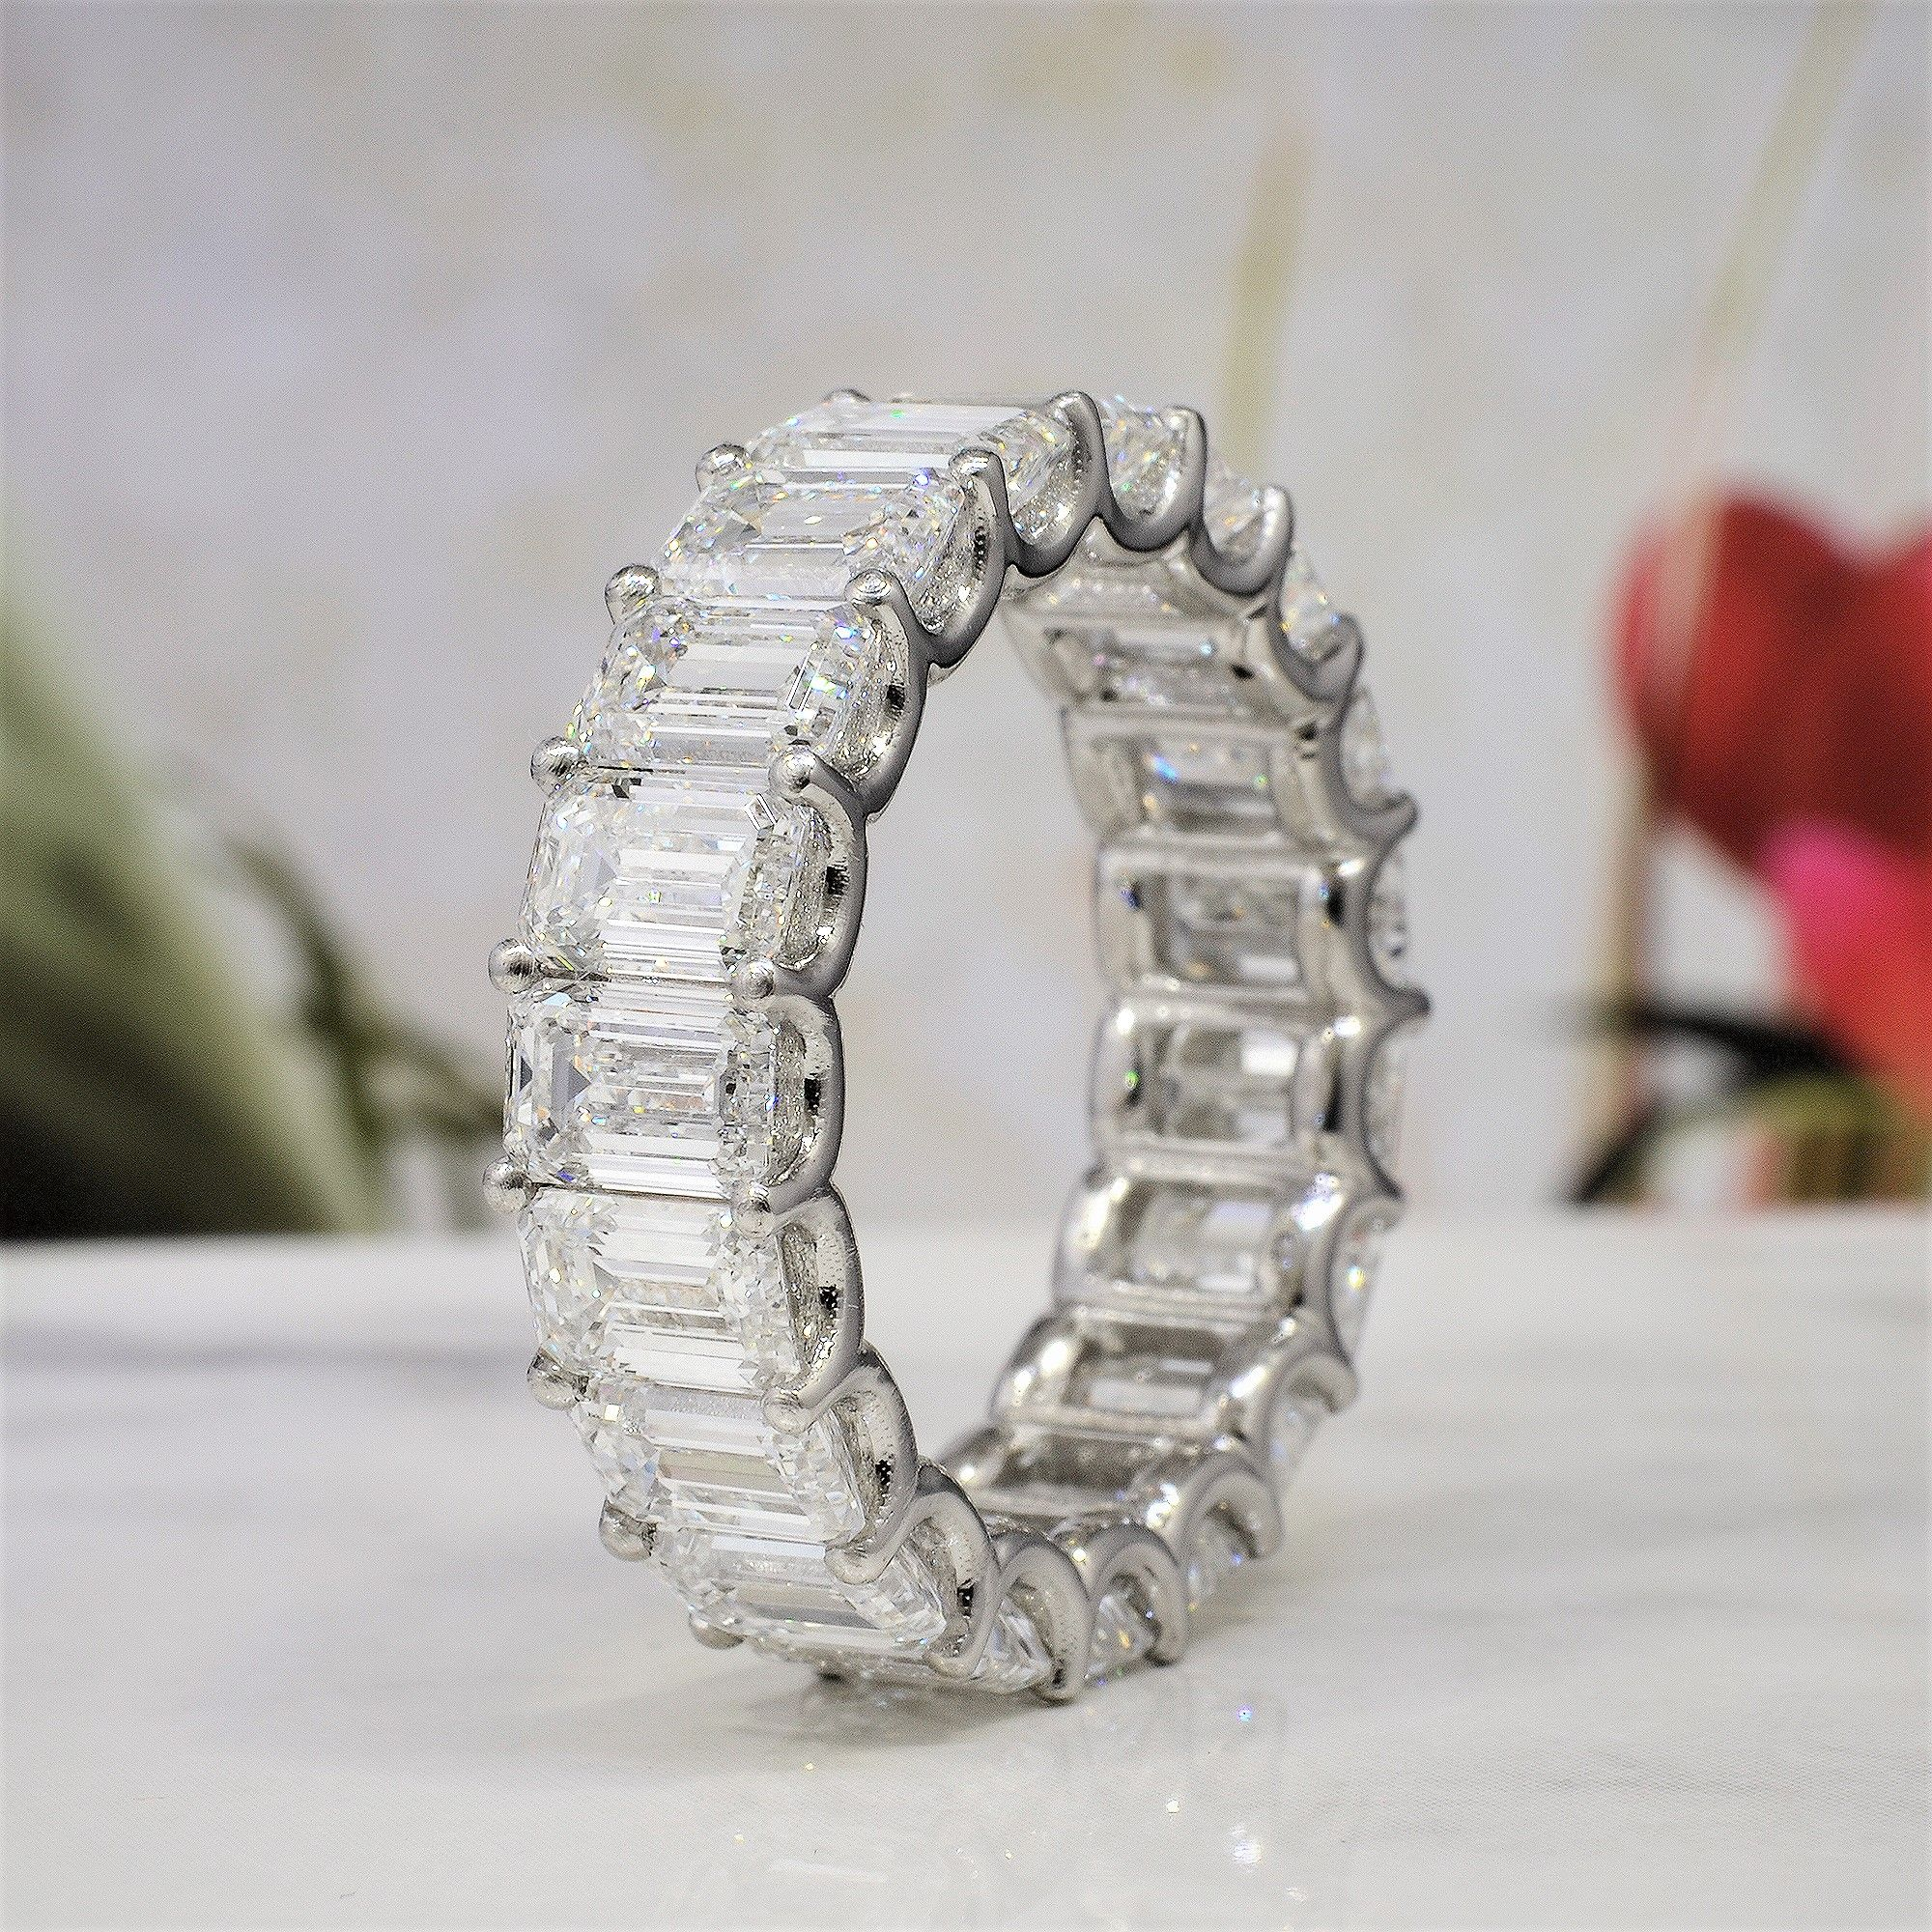 9 Carat  Emerald Cut Diamond Eternity Ring In White Gold and Platinum - U-Setting